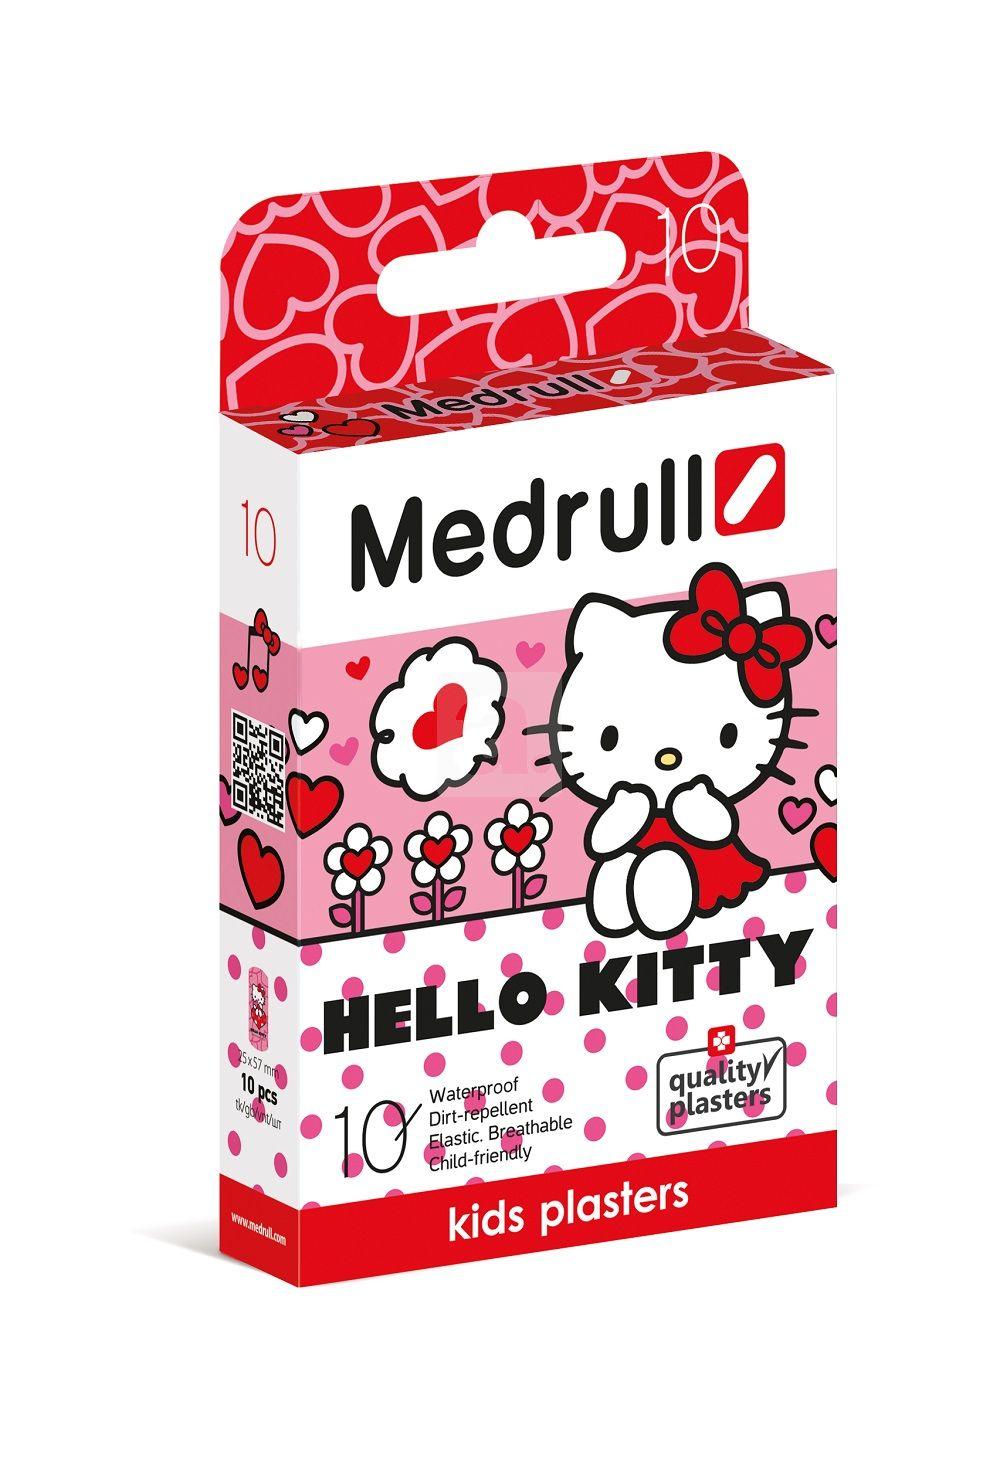 Vaikiškas pleistras MEDRULL Hello Kitty kūdikiams nuo 3 mėn., 10 vnt.